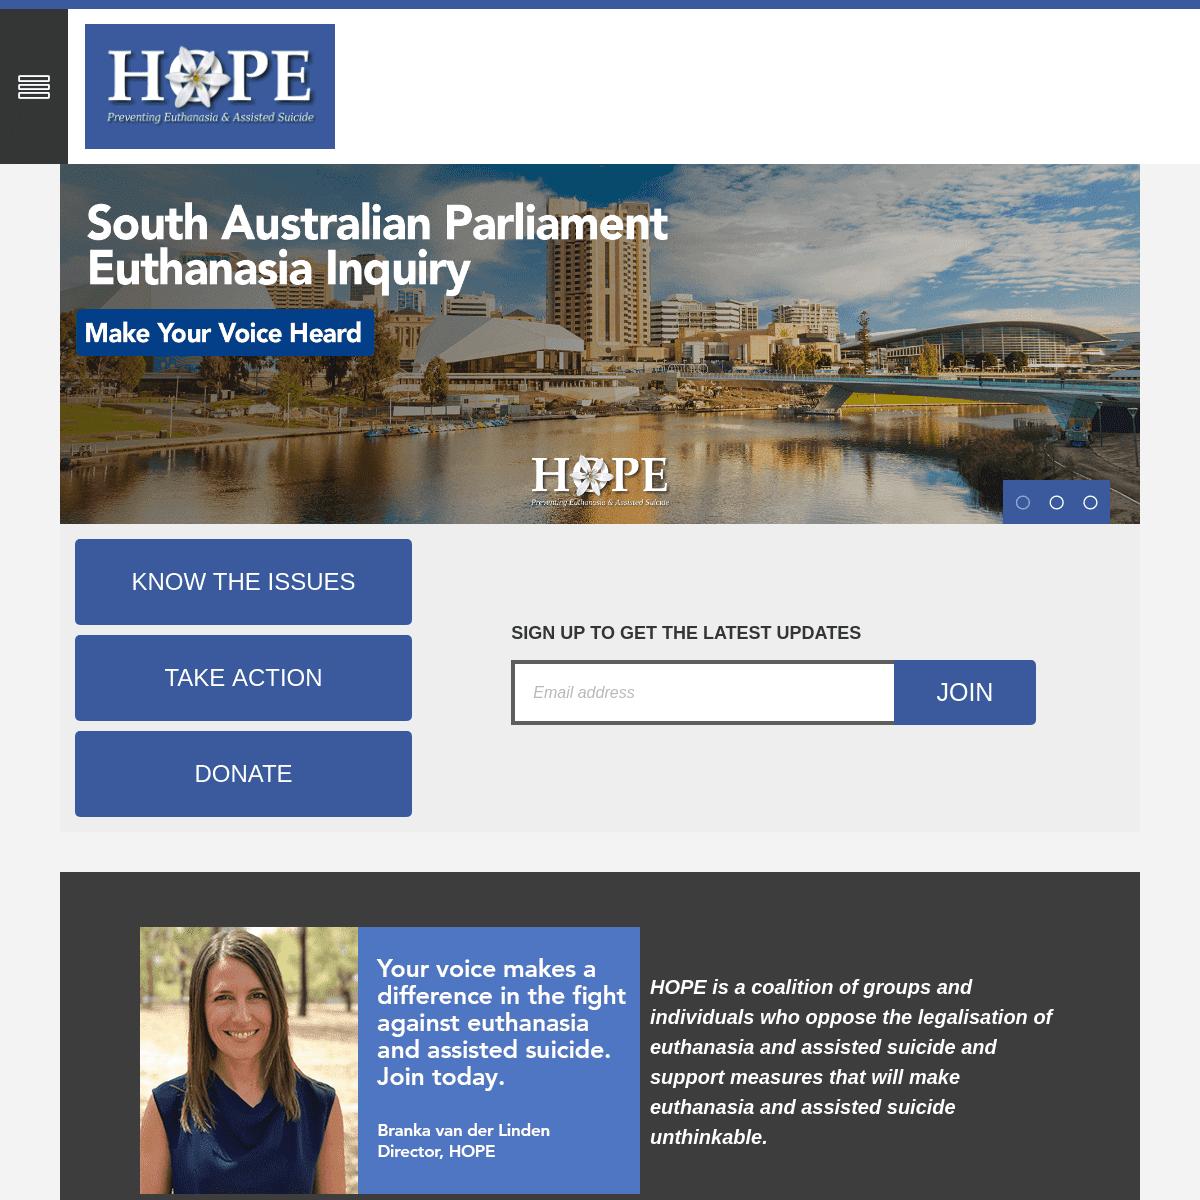 Hope Australia